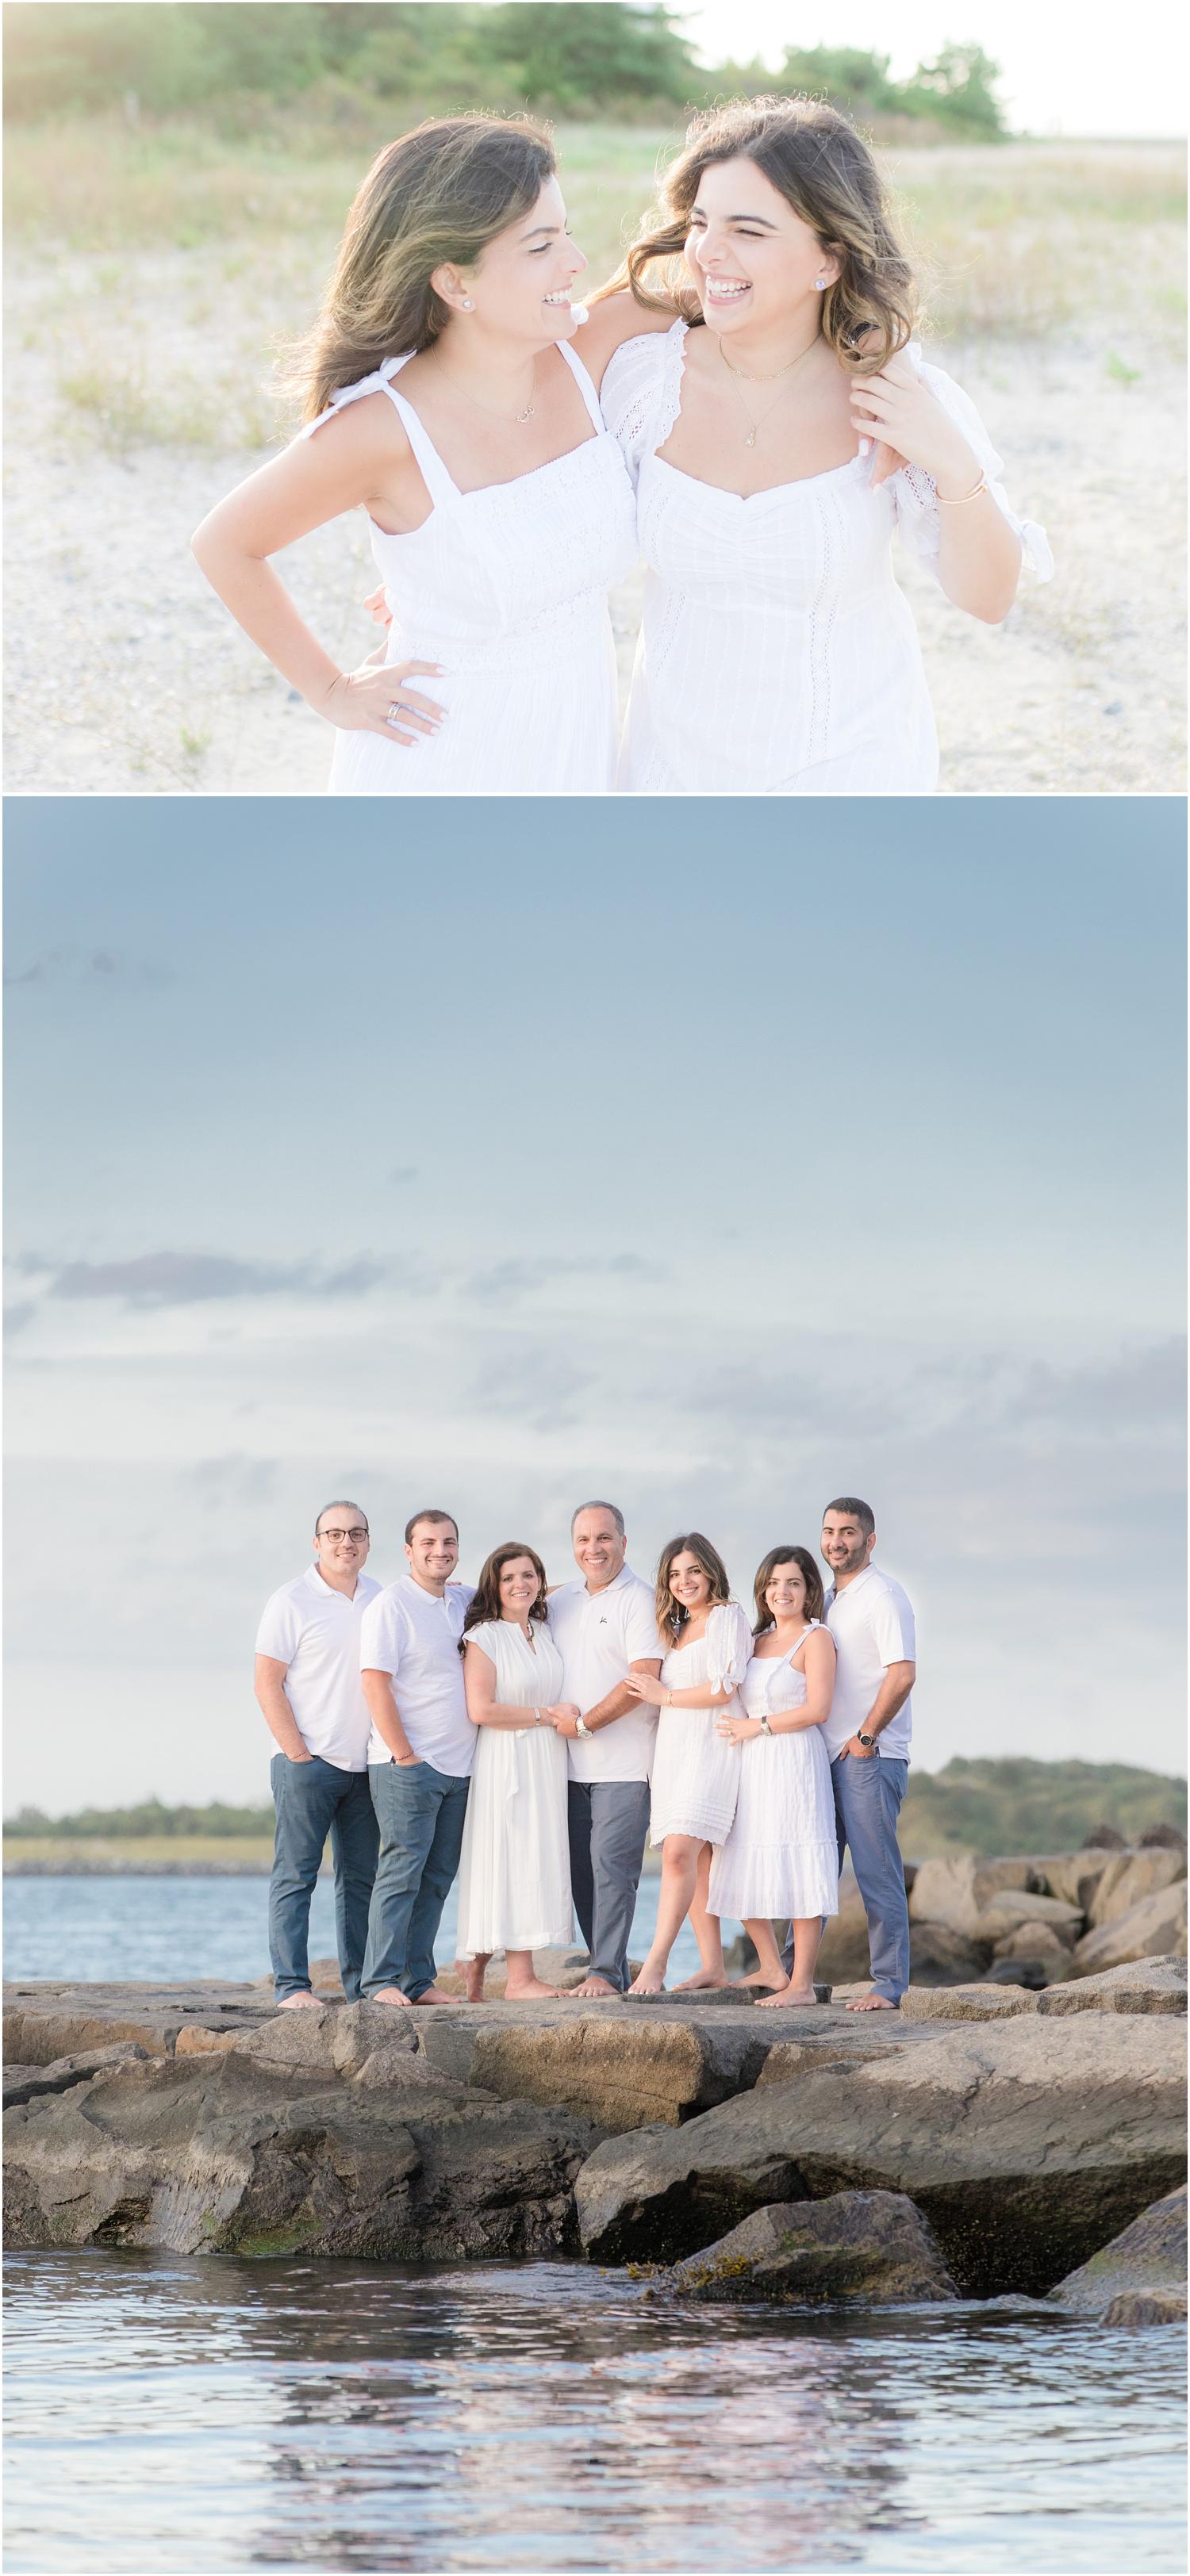 Family photos at the beach on a Jetty in Long Beach Island